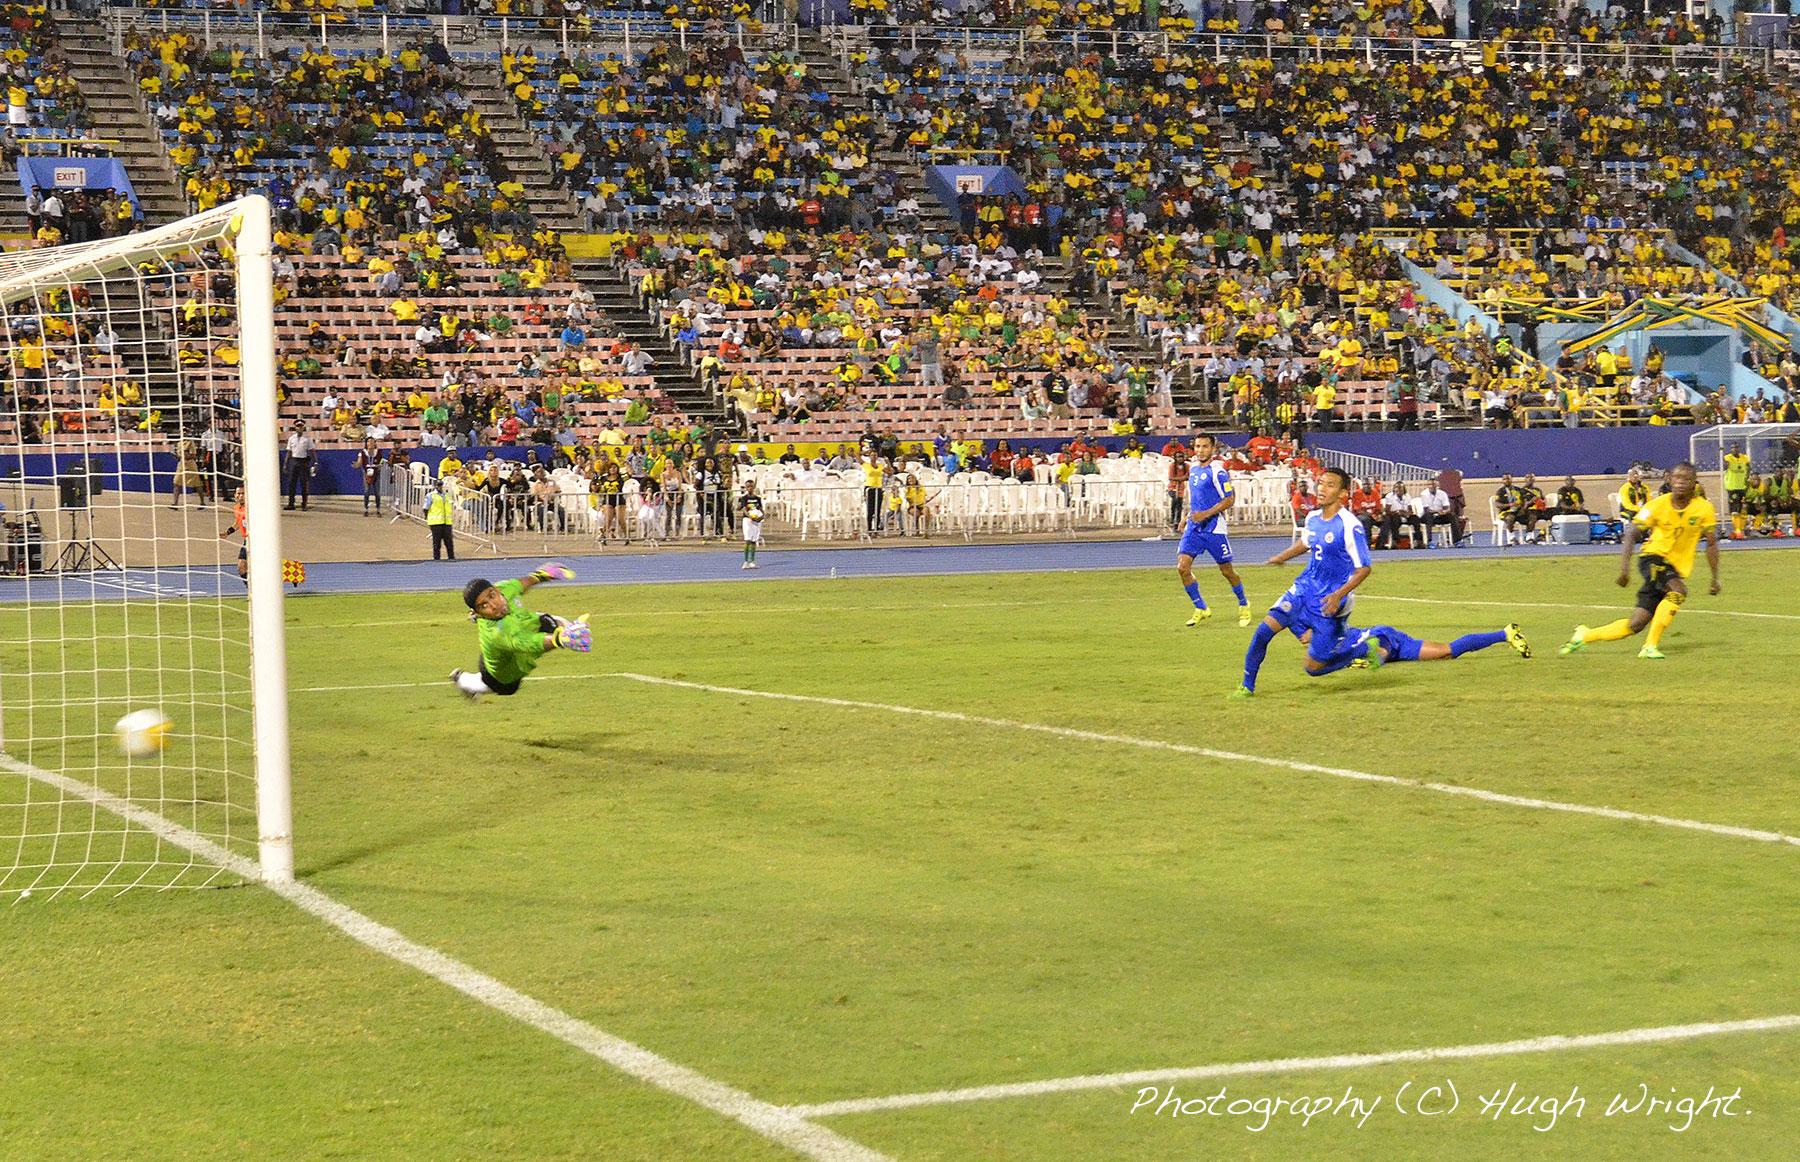 GOAL JAMAICA vs NICARAGUA